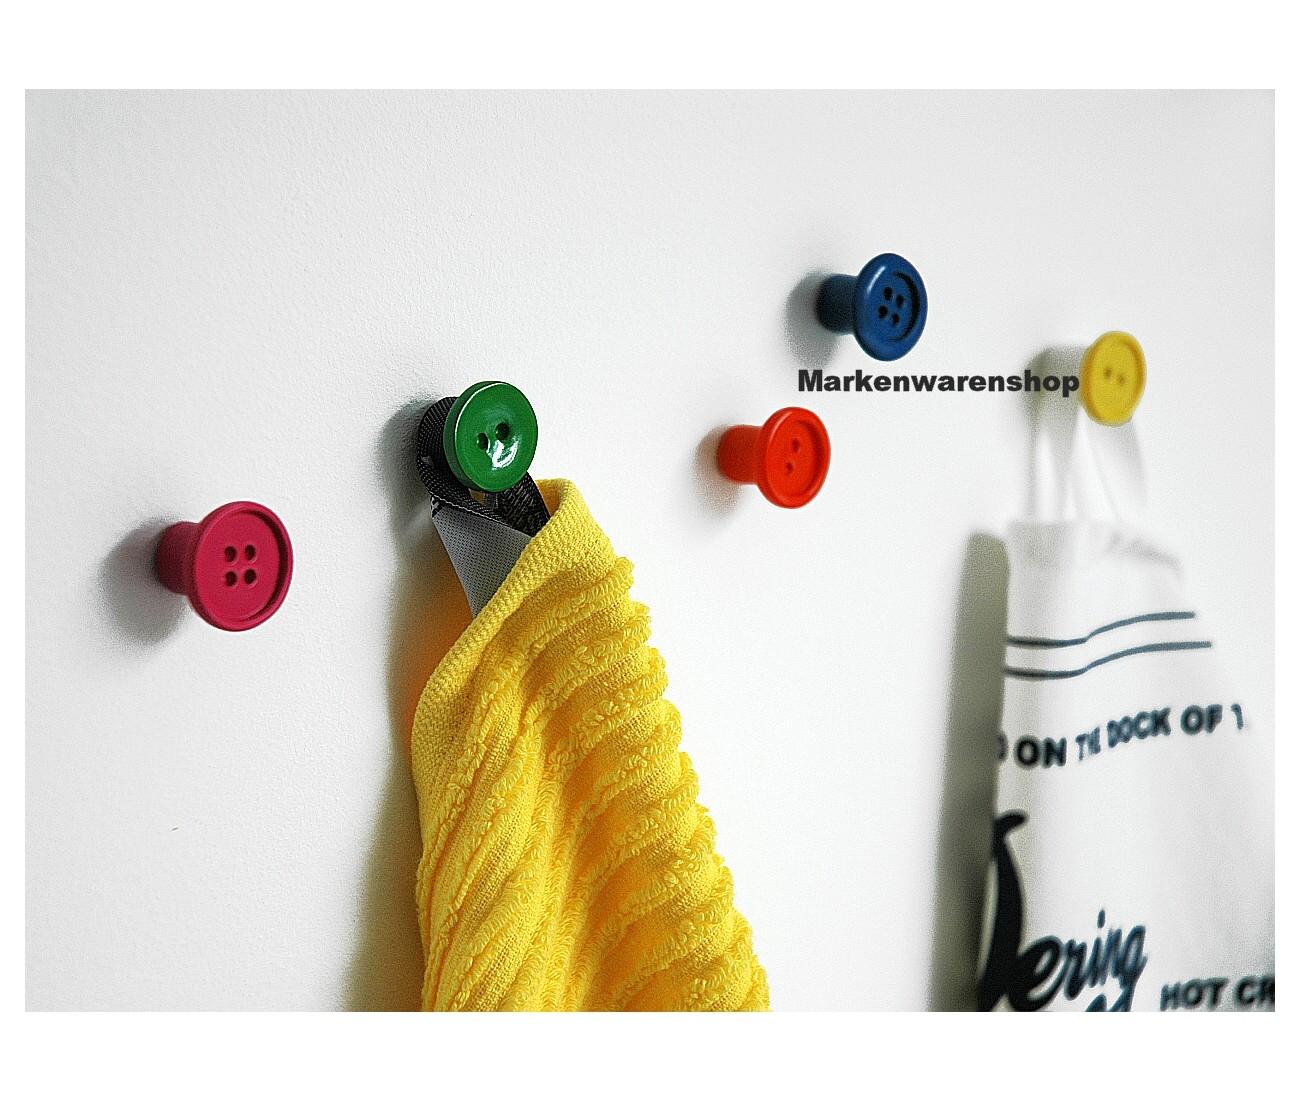 puhlmann wandhaken 5er set kn pfe bunt kleiderhaken garderobe haken cabanaz ebay. Black Bedroom Furniture Sets. Home Design Ideas